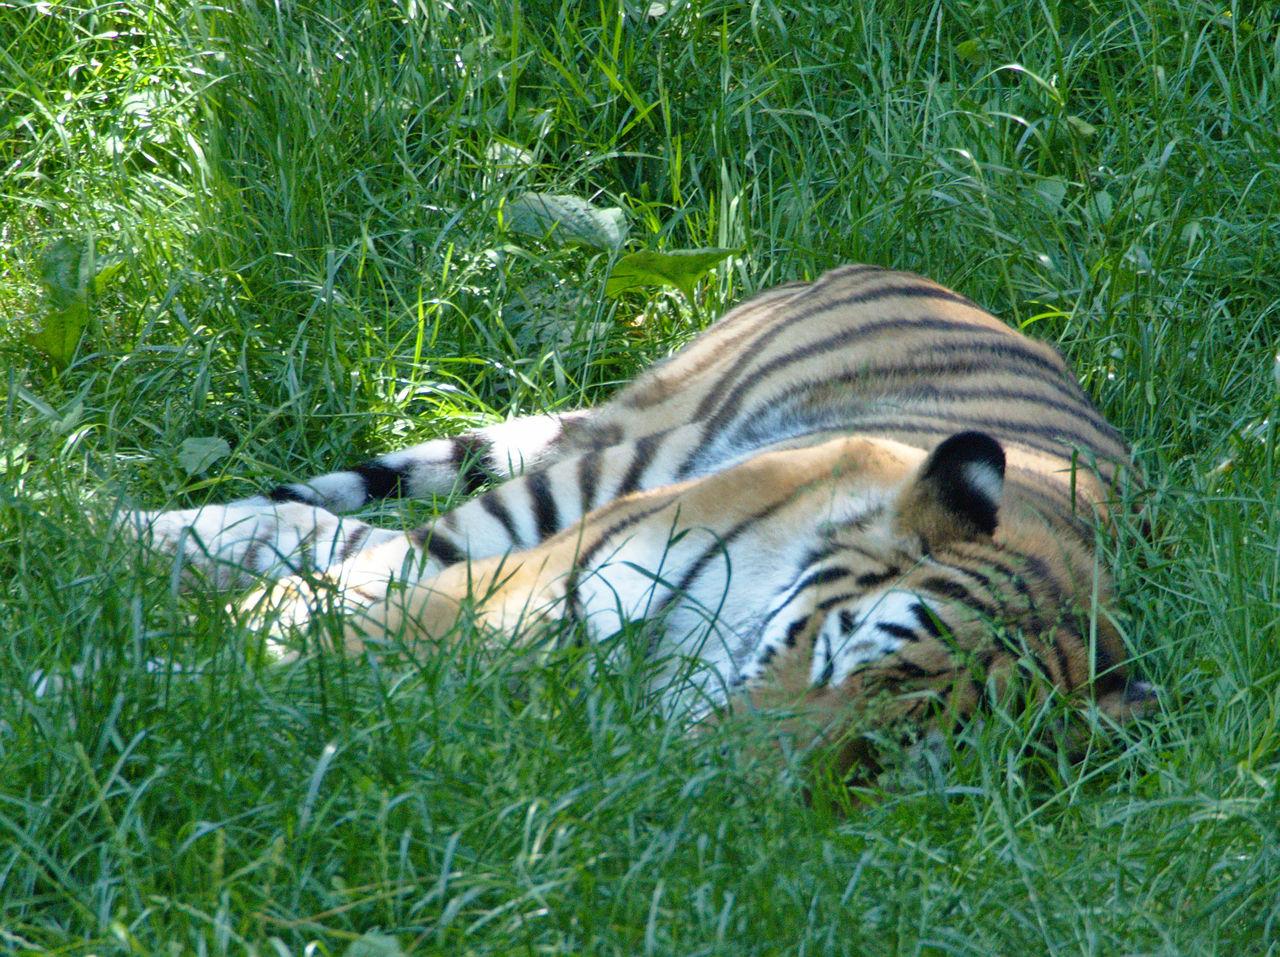 20190613_Zoo_Landau_001